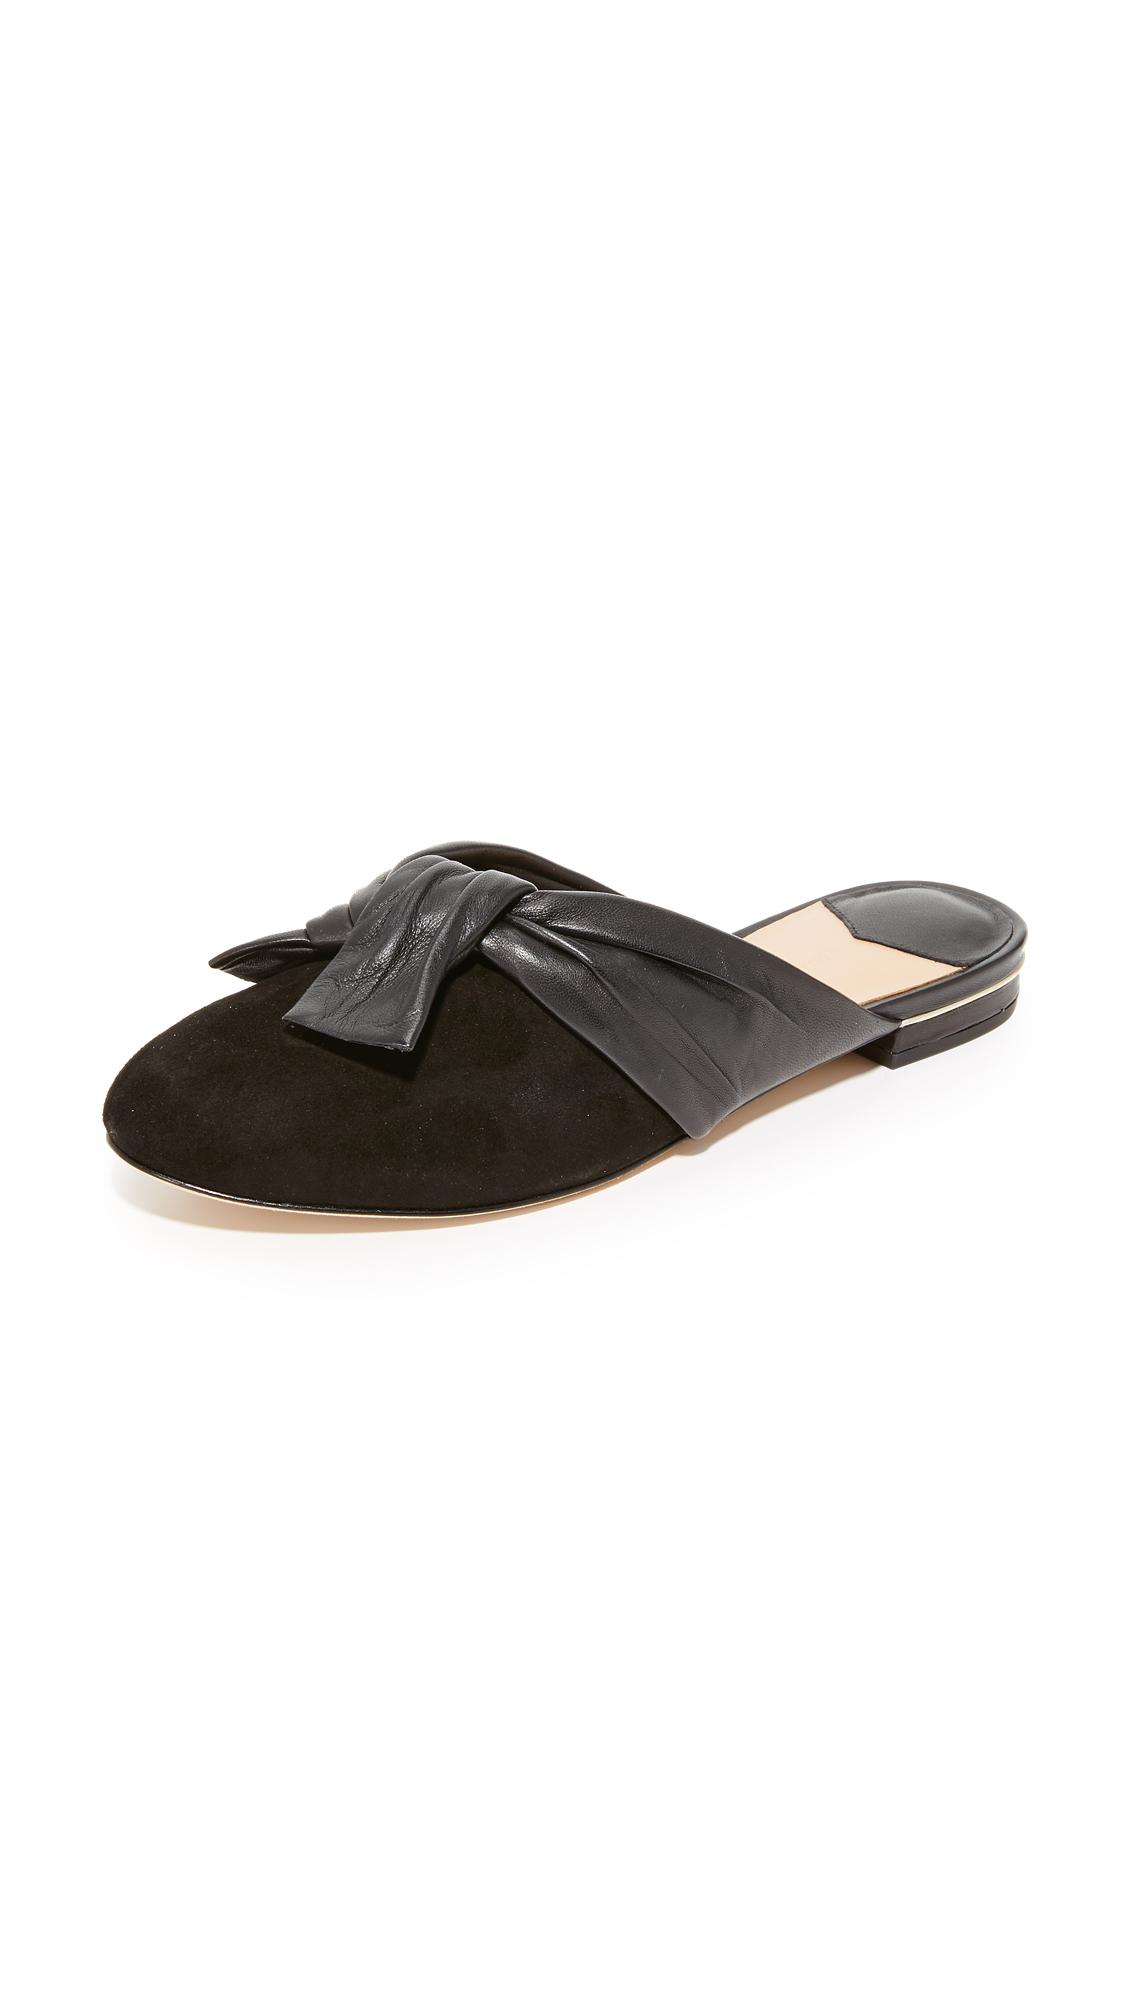 Diane Von Furstenberg Doha Knot Mules - Black at Shopbop